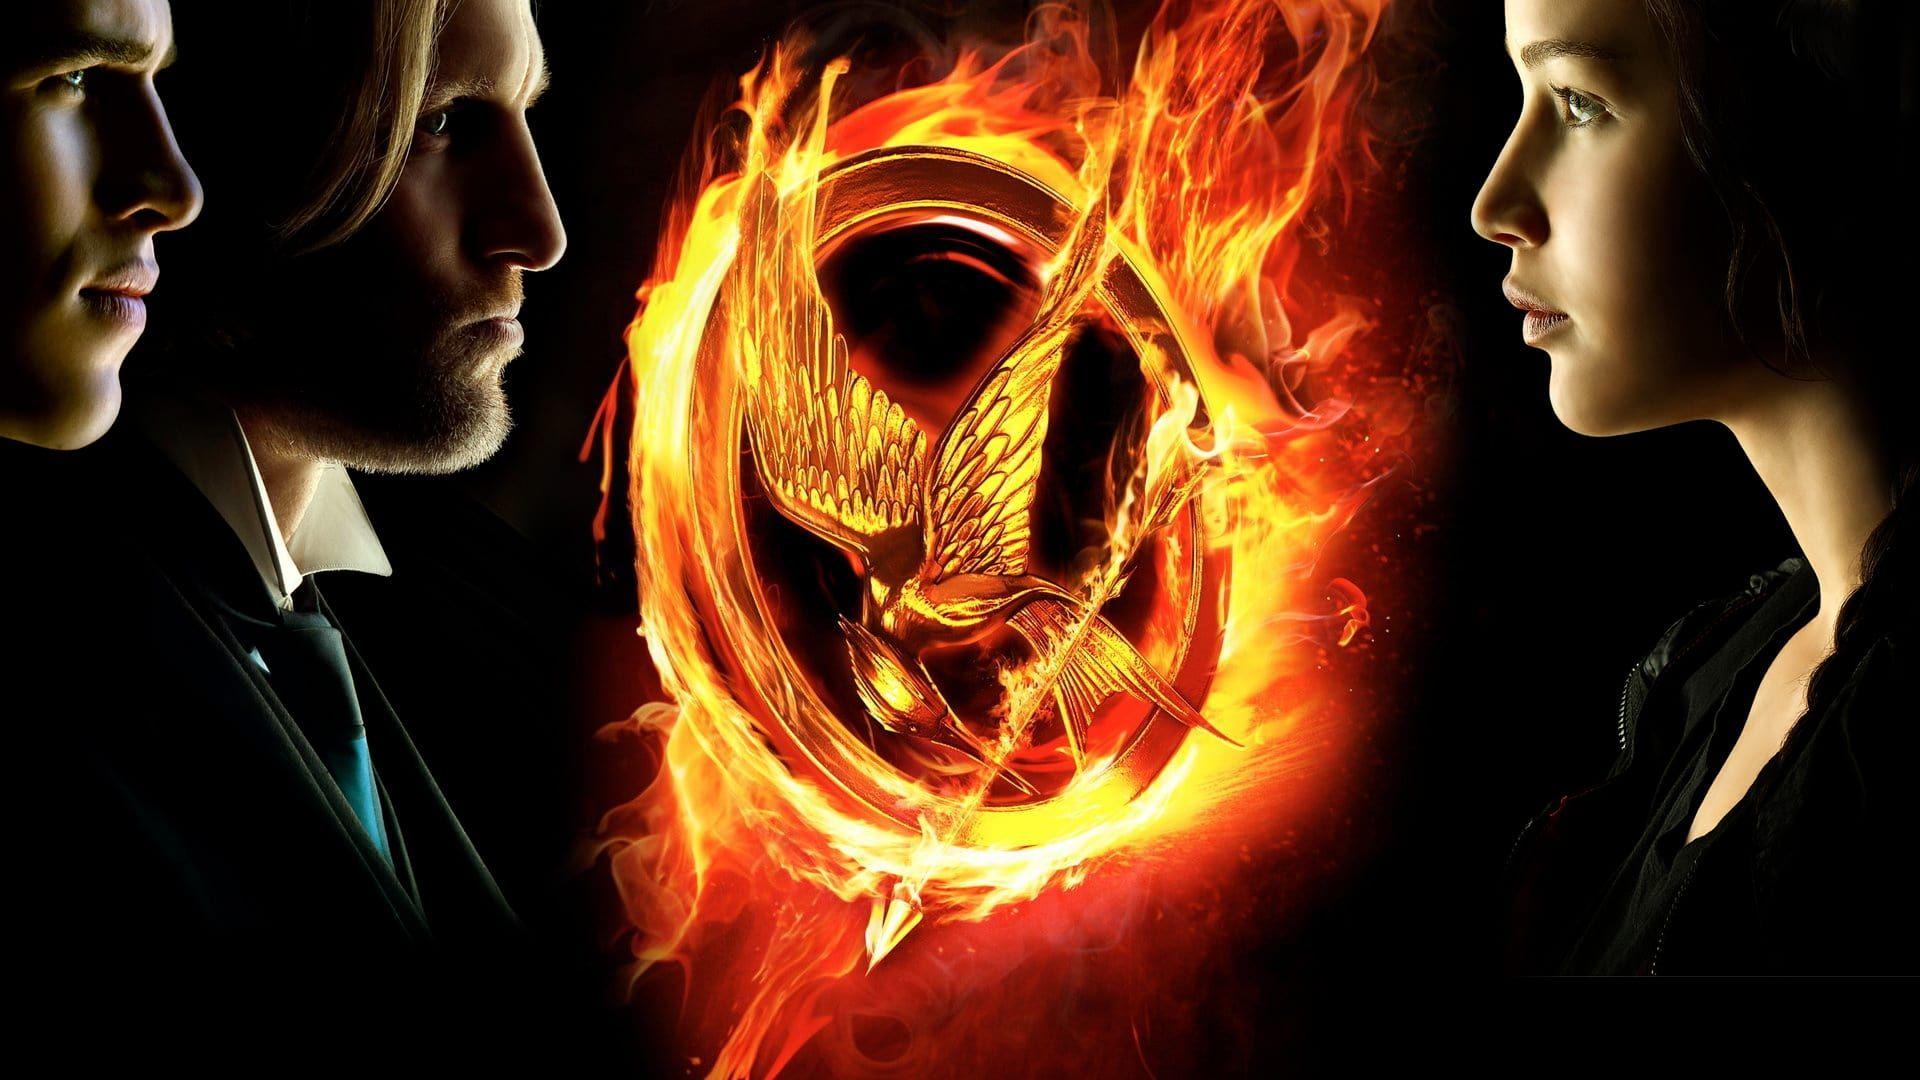 Watch Hunger Games L Embrasement 2013 Putlocker Film Complet Streaming Apres Les Premiers Hunger Games Catching Fire Hunger Games Hunger Games Catching Fire